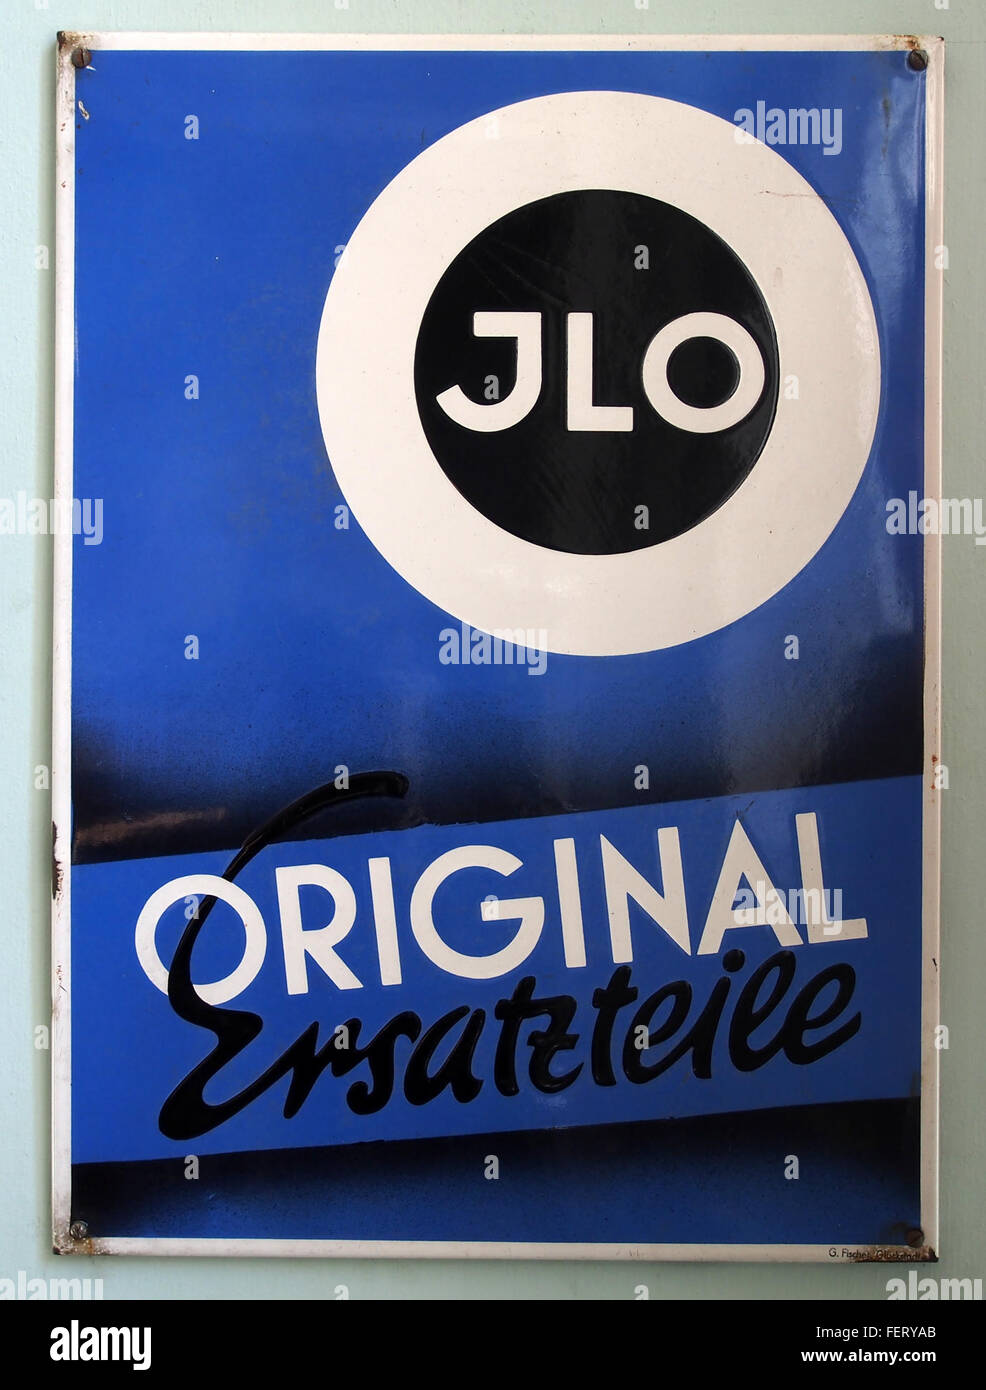 JLO Ersatzteile, Emaille werbung - Stock Image